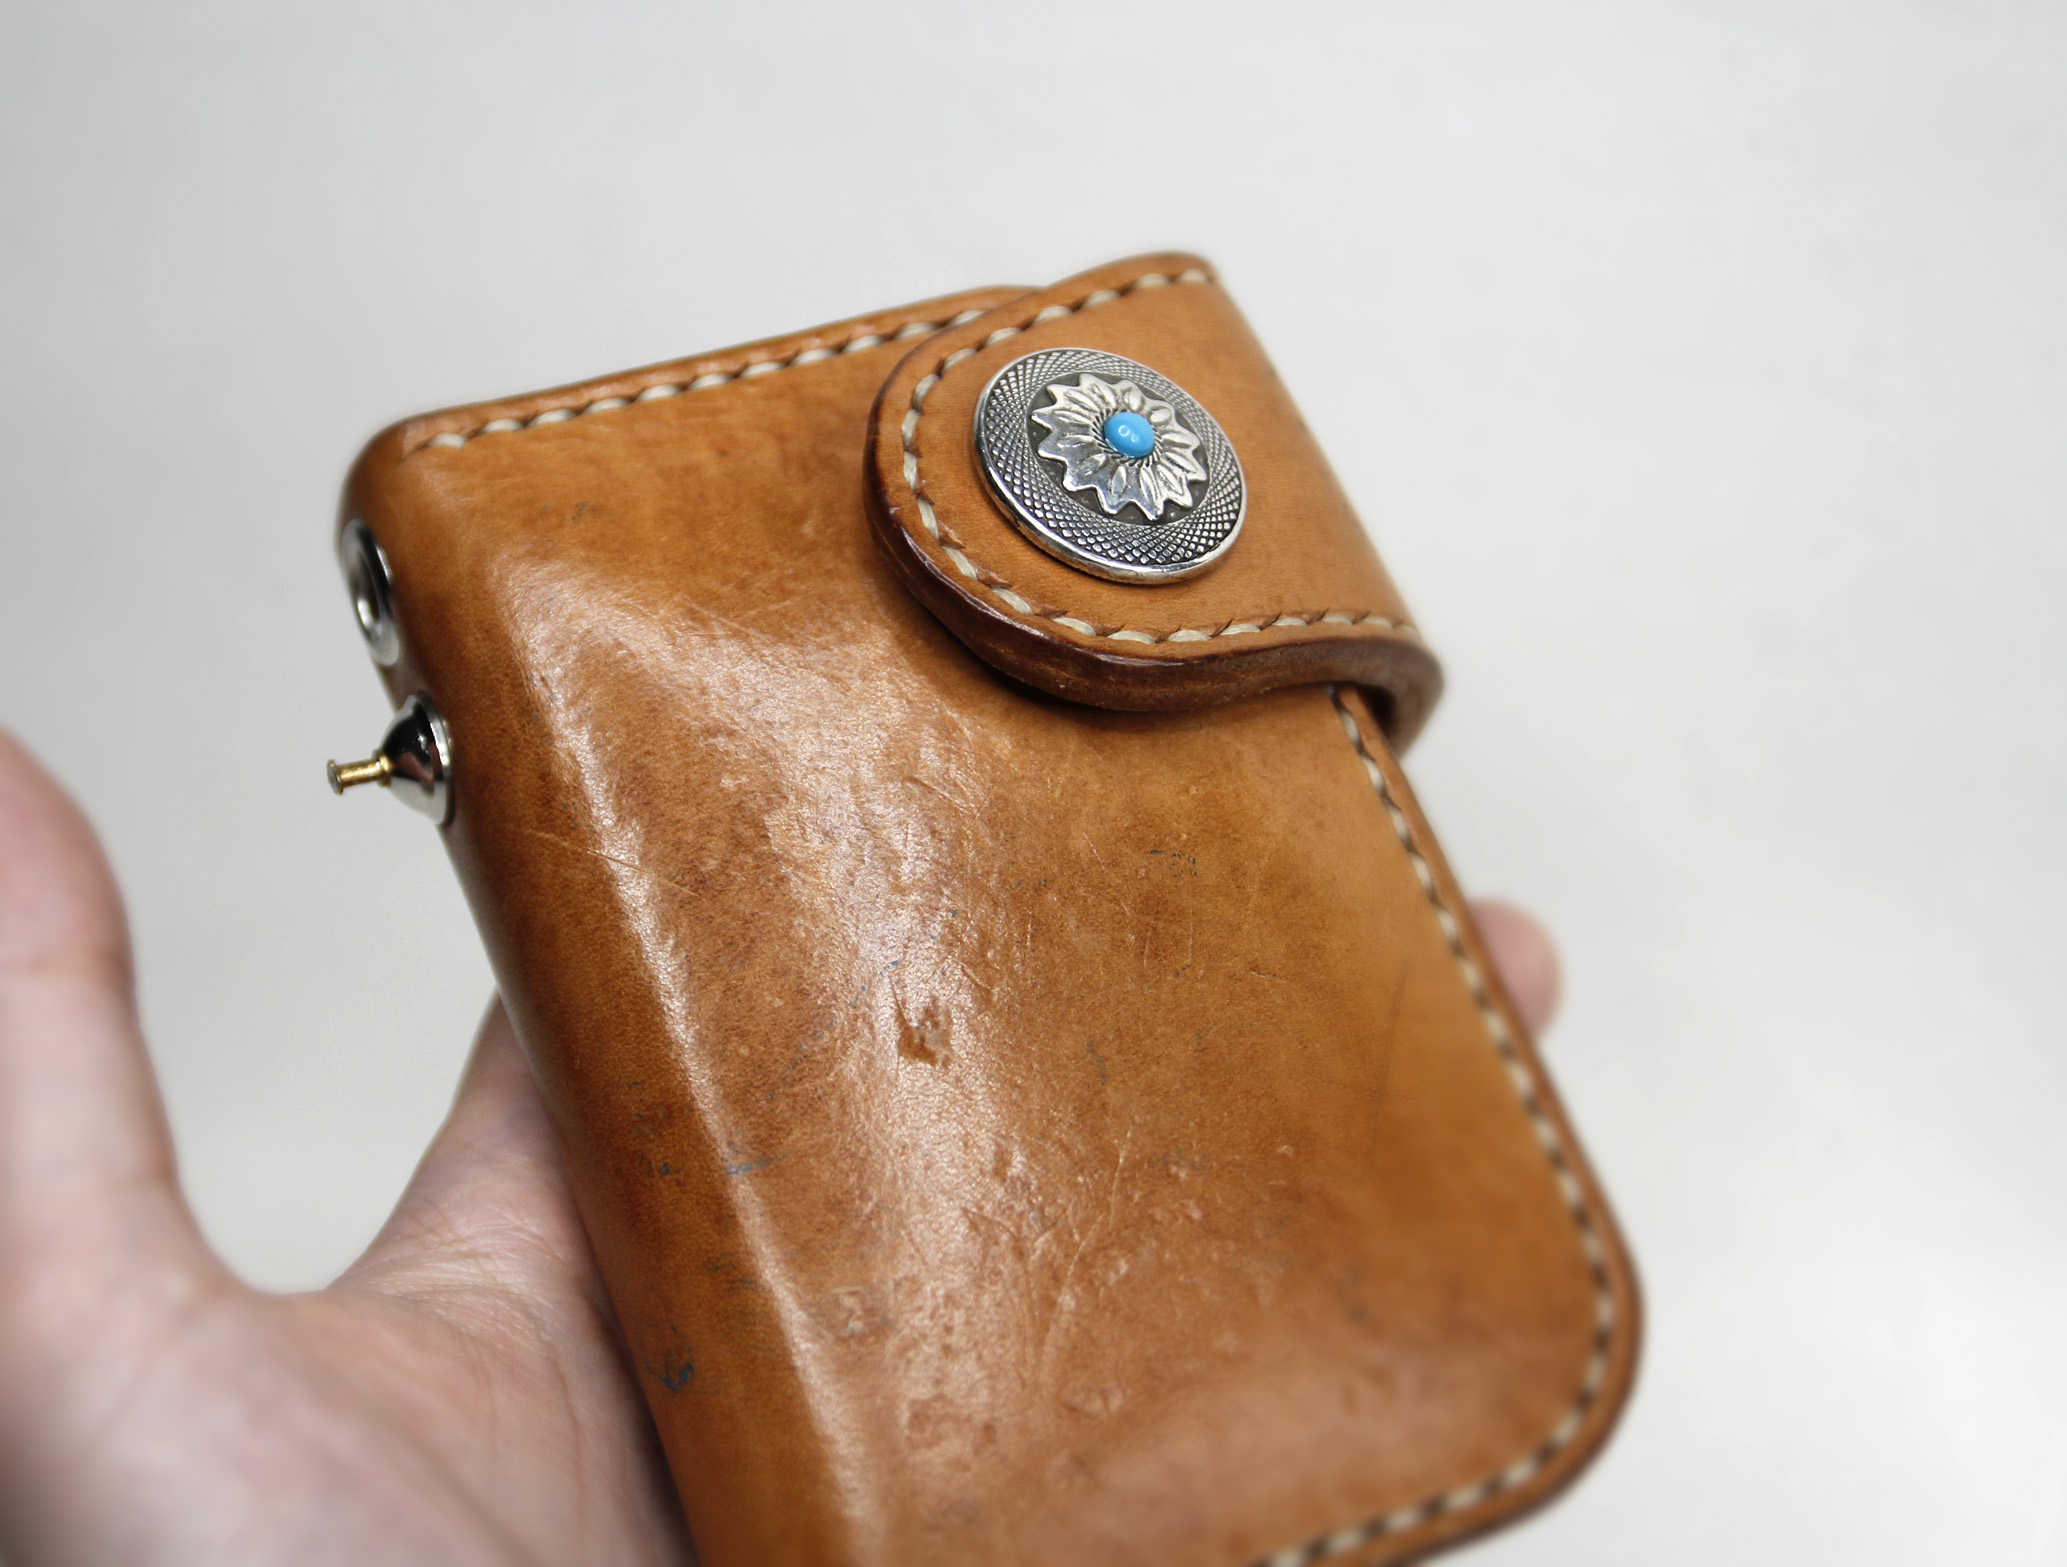 Hong Kong - handmade leather goods | Styleforum